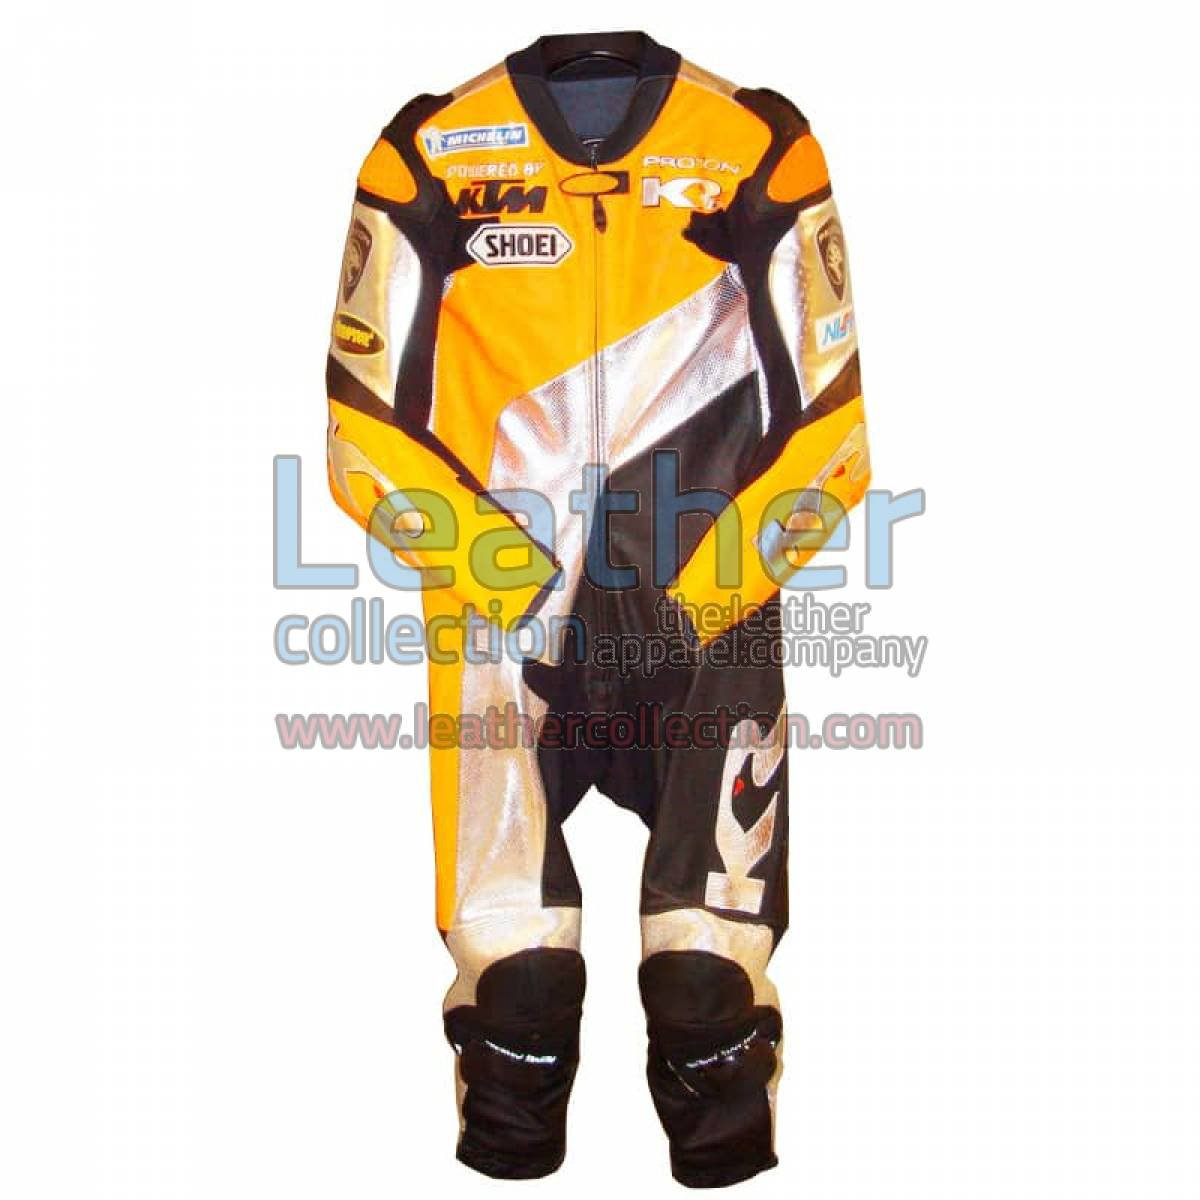 Shane Byrne KTM GP 2005 Leathers